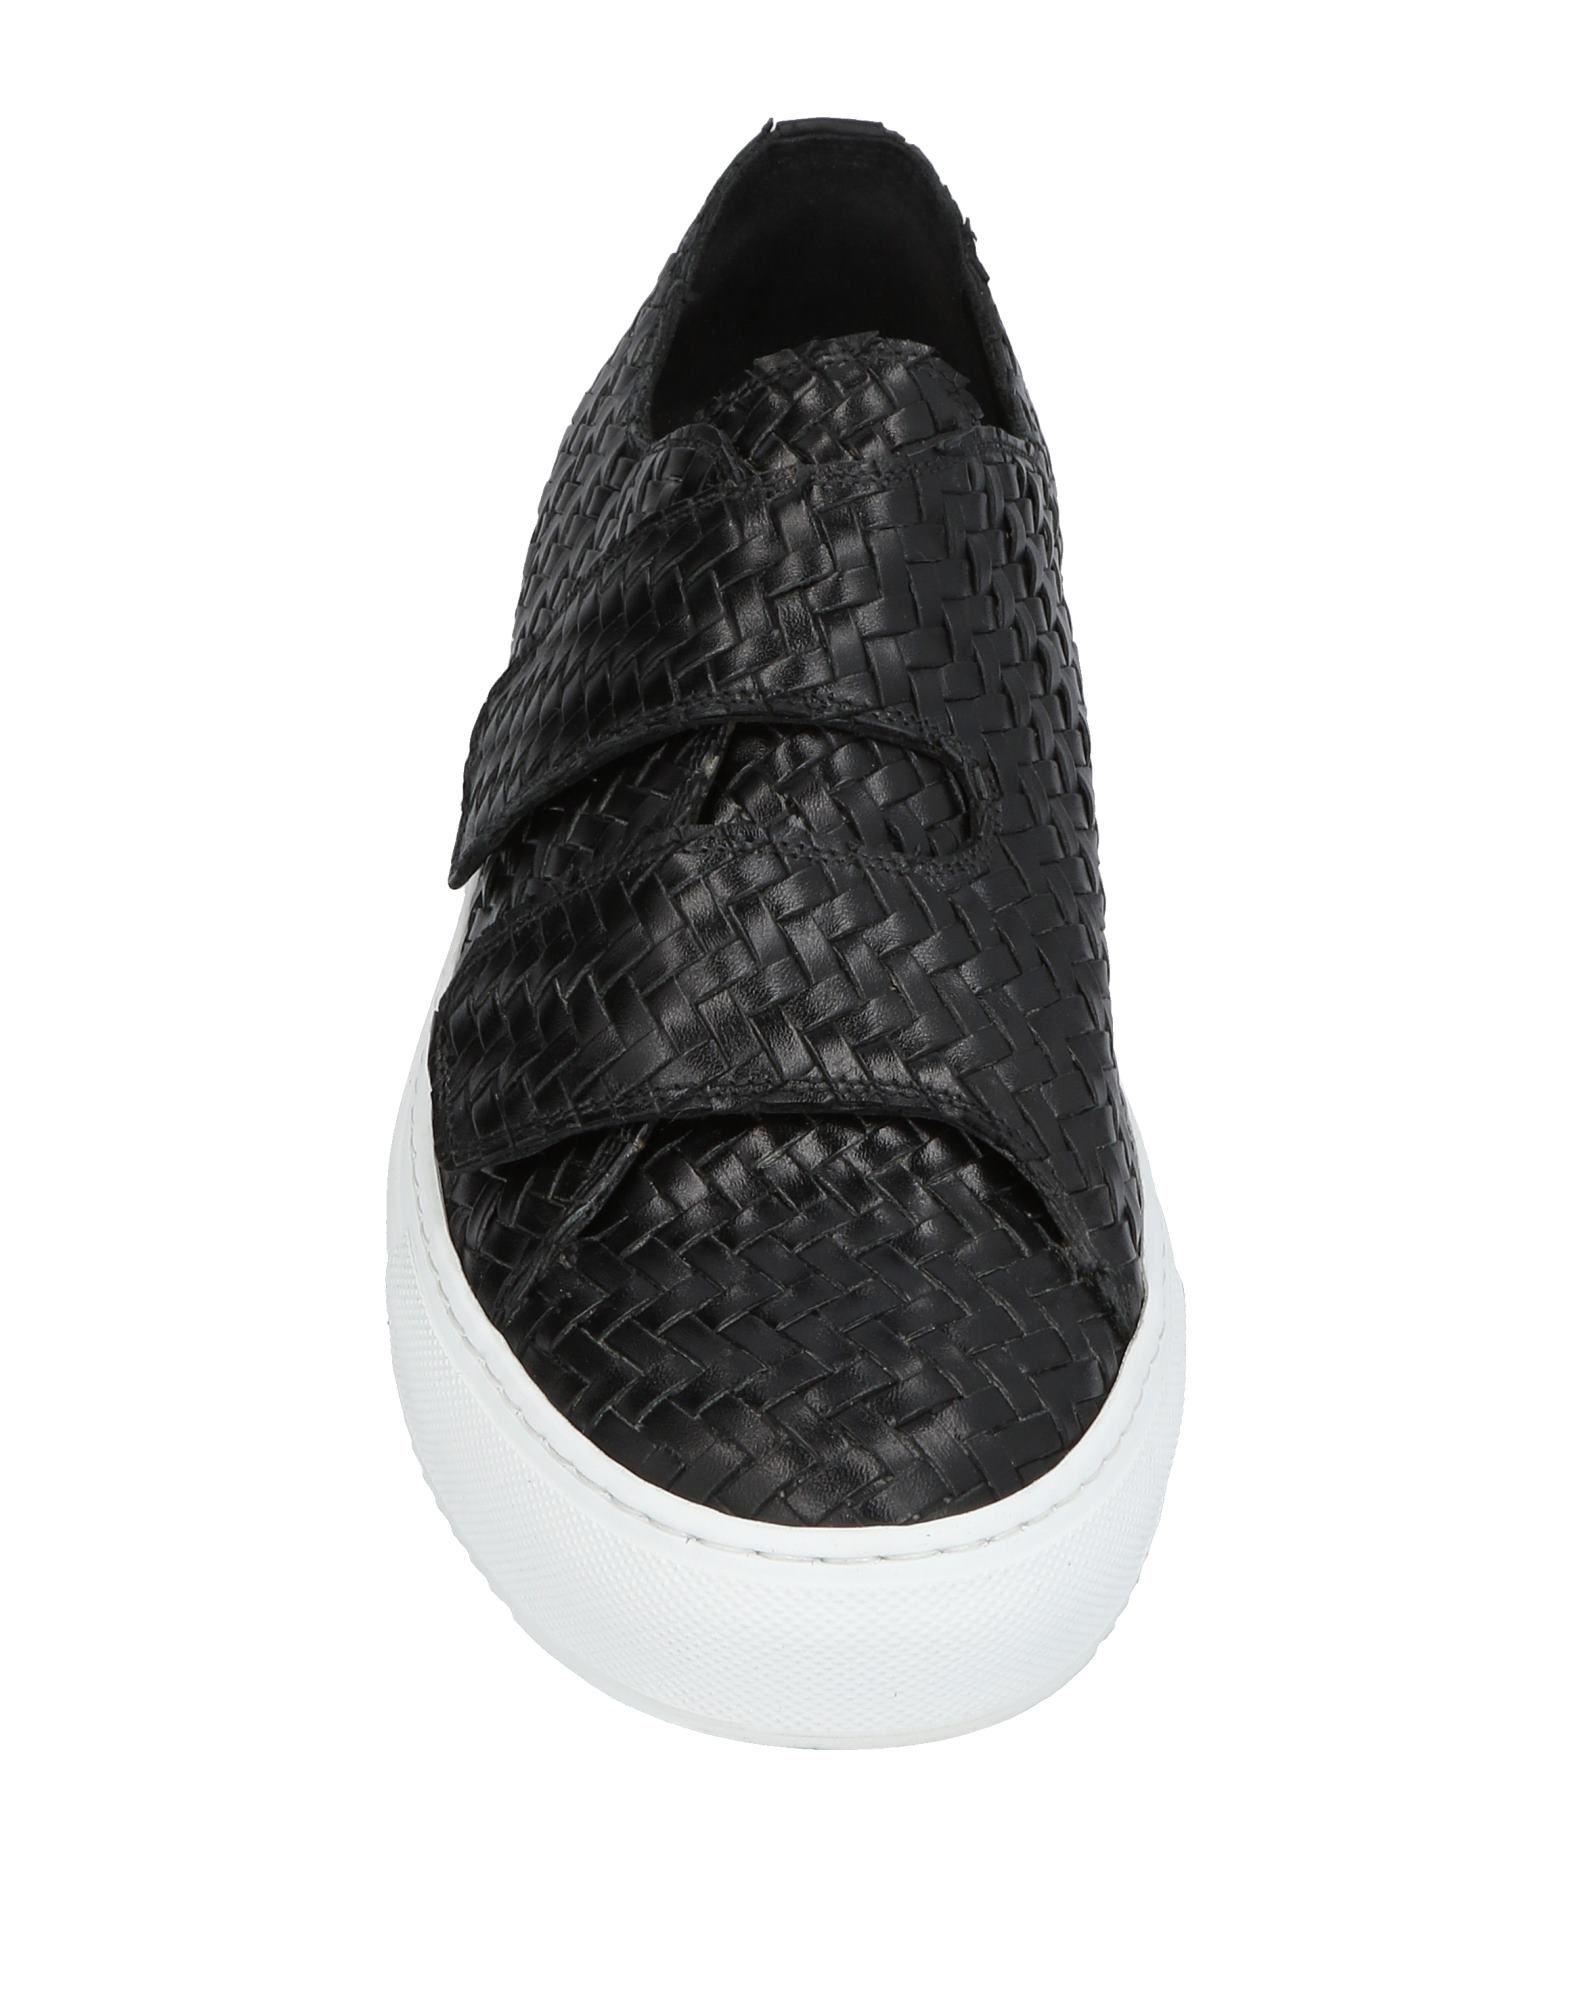 Raparo Sneakers Herren  11459326BS 11459326BS 11459326BS Gute Qualität beliebte Schuhe 35e139